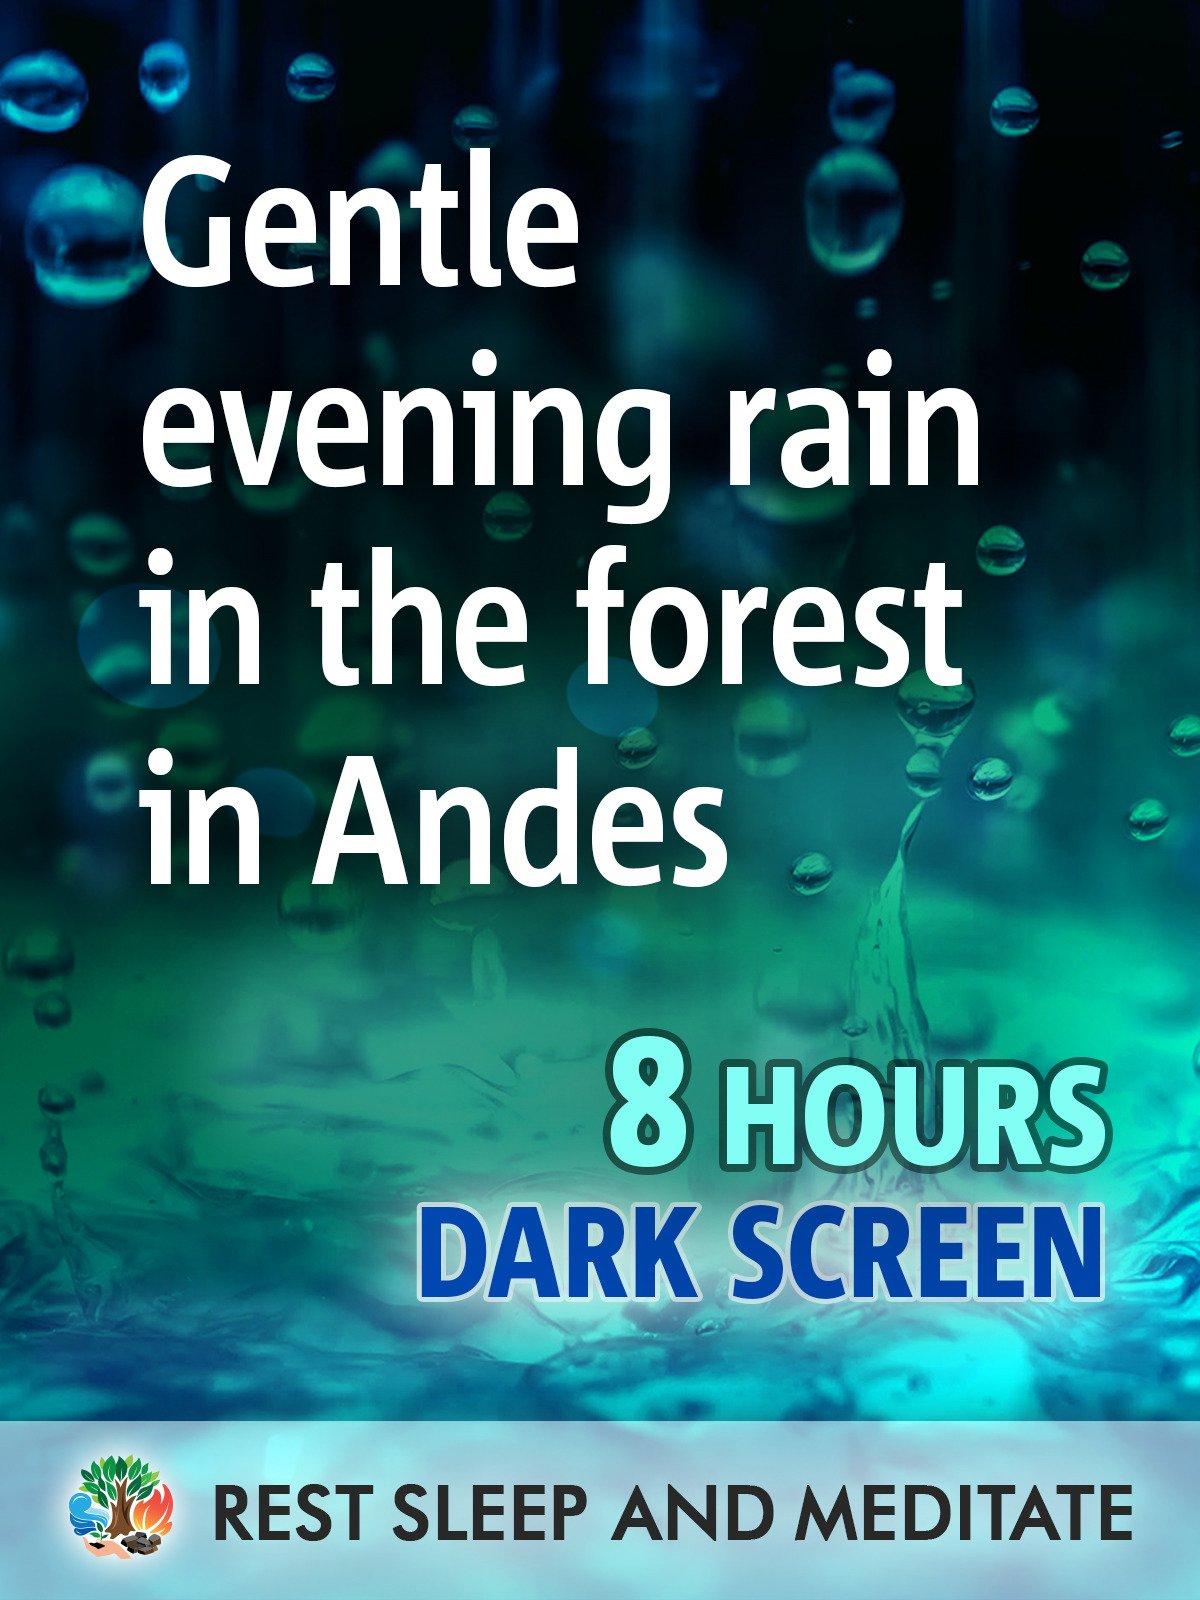 Gentle evening rain in tropical forest, 8 hours, dark screen